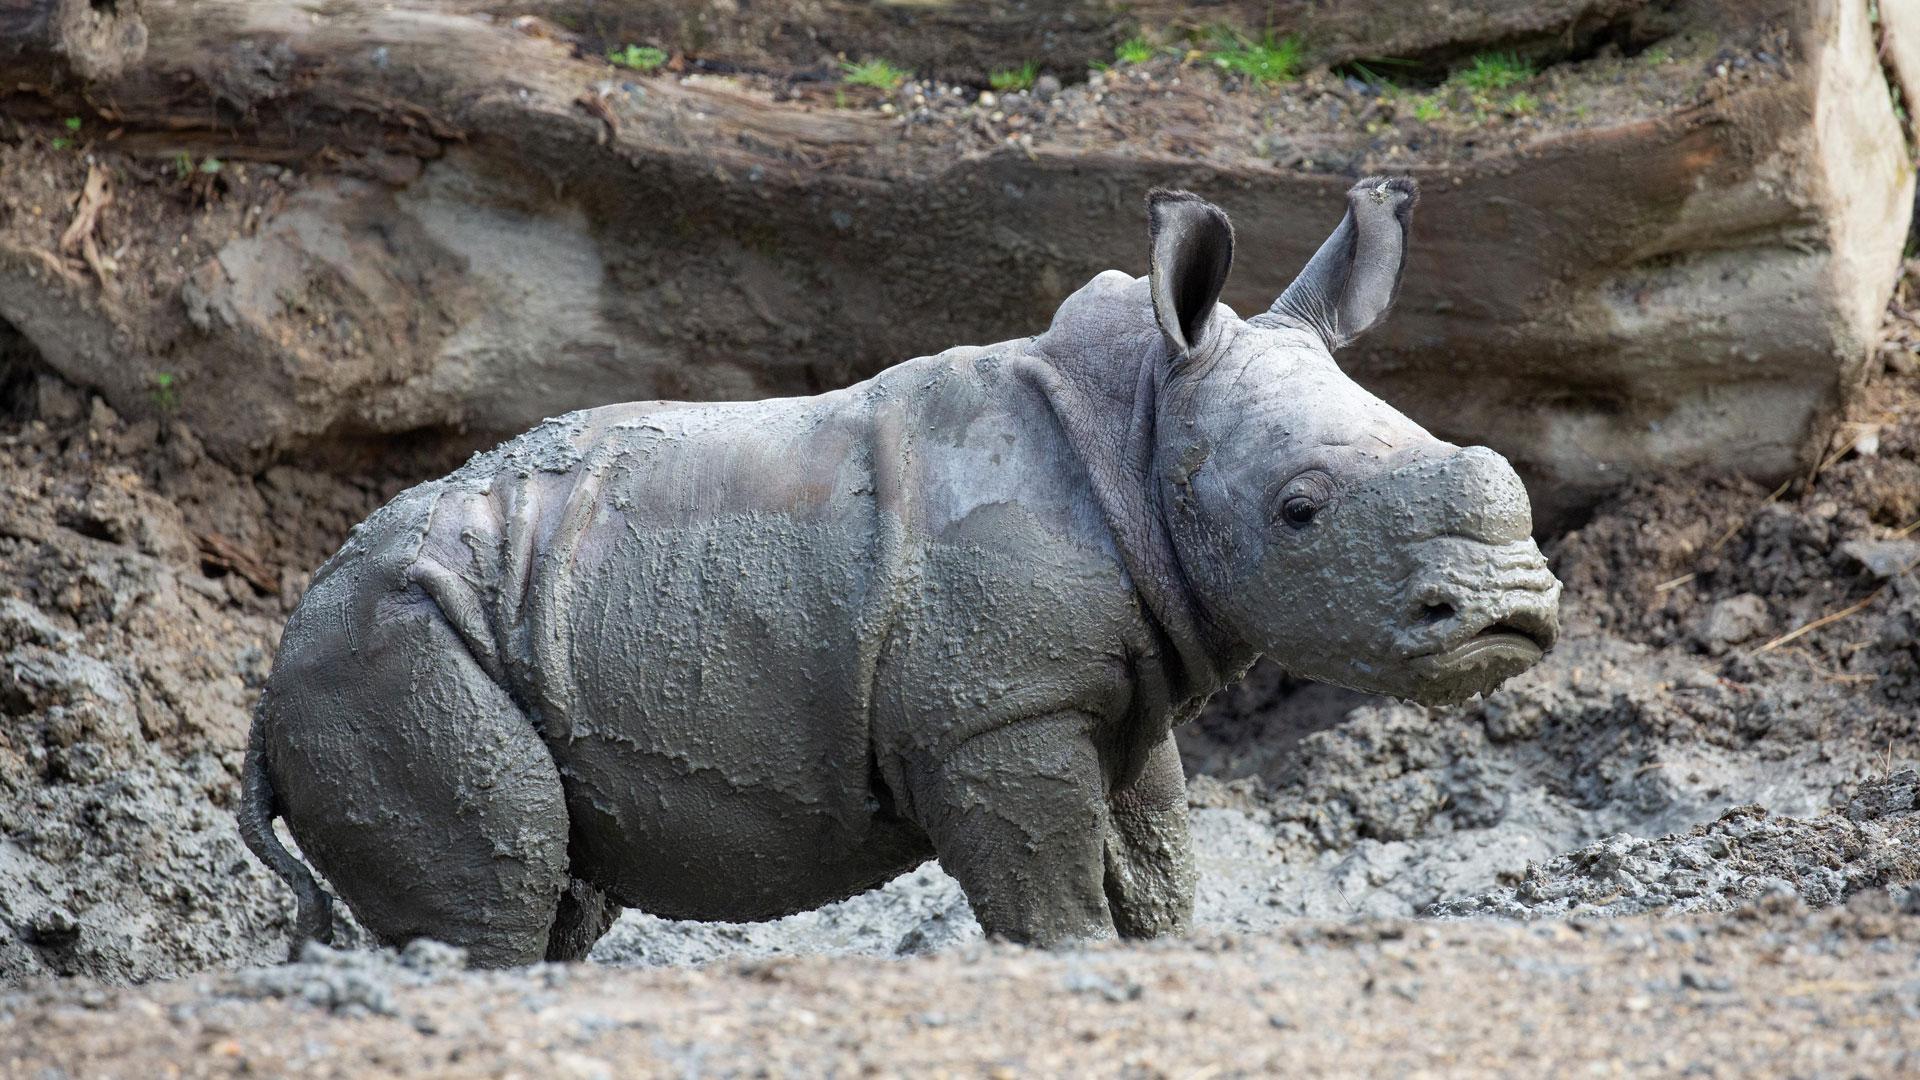 https://rfacdn.nz/zoo/assets/media/rhino-calf-in-habitat-gallery-2.jpg